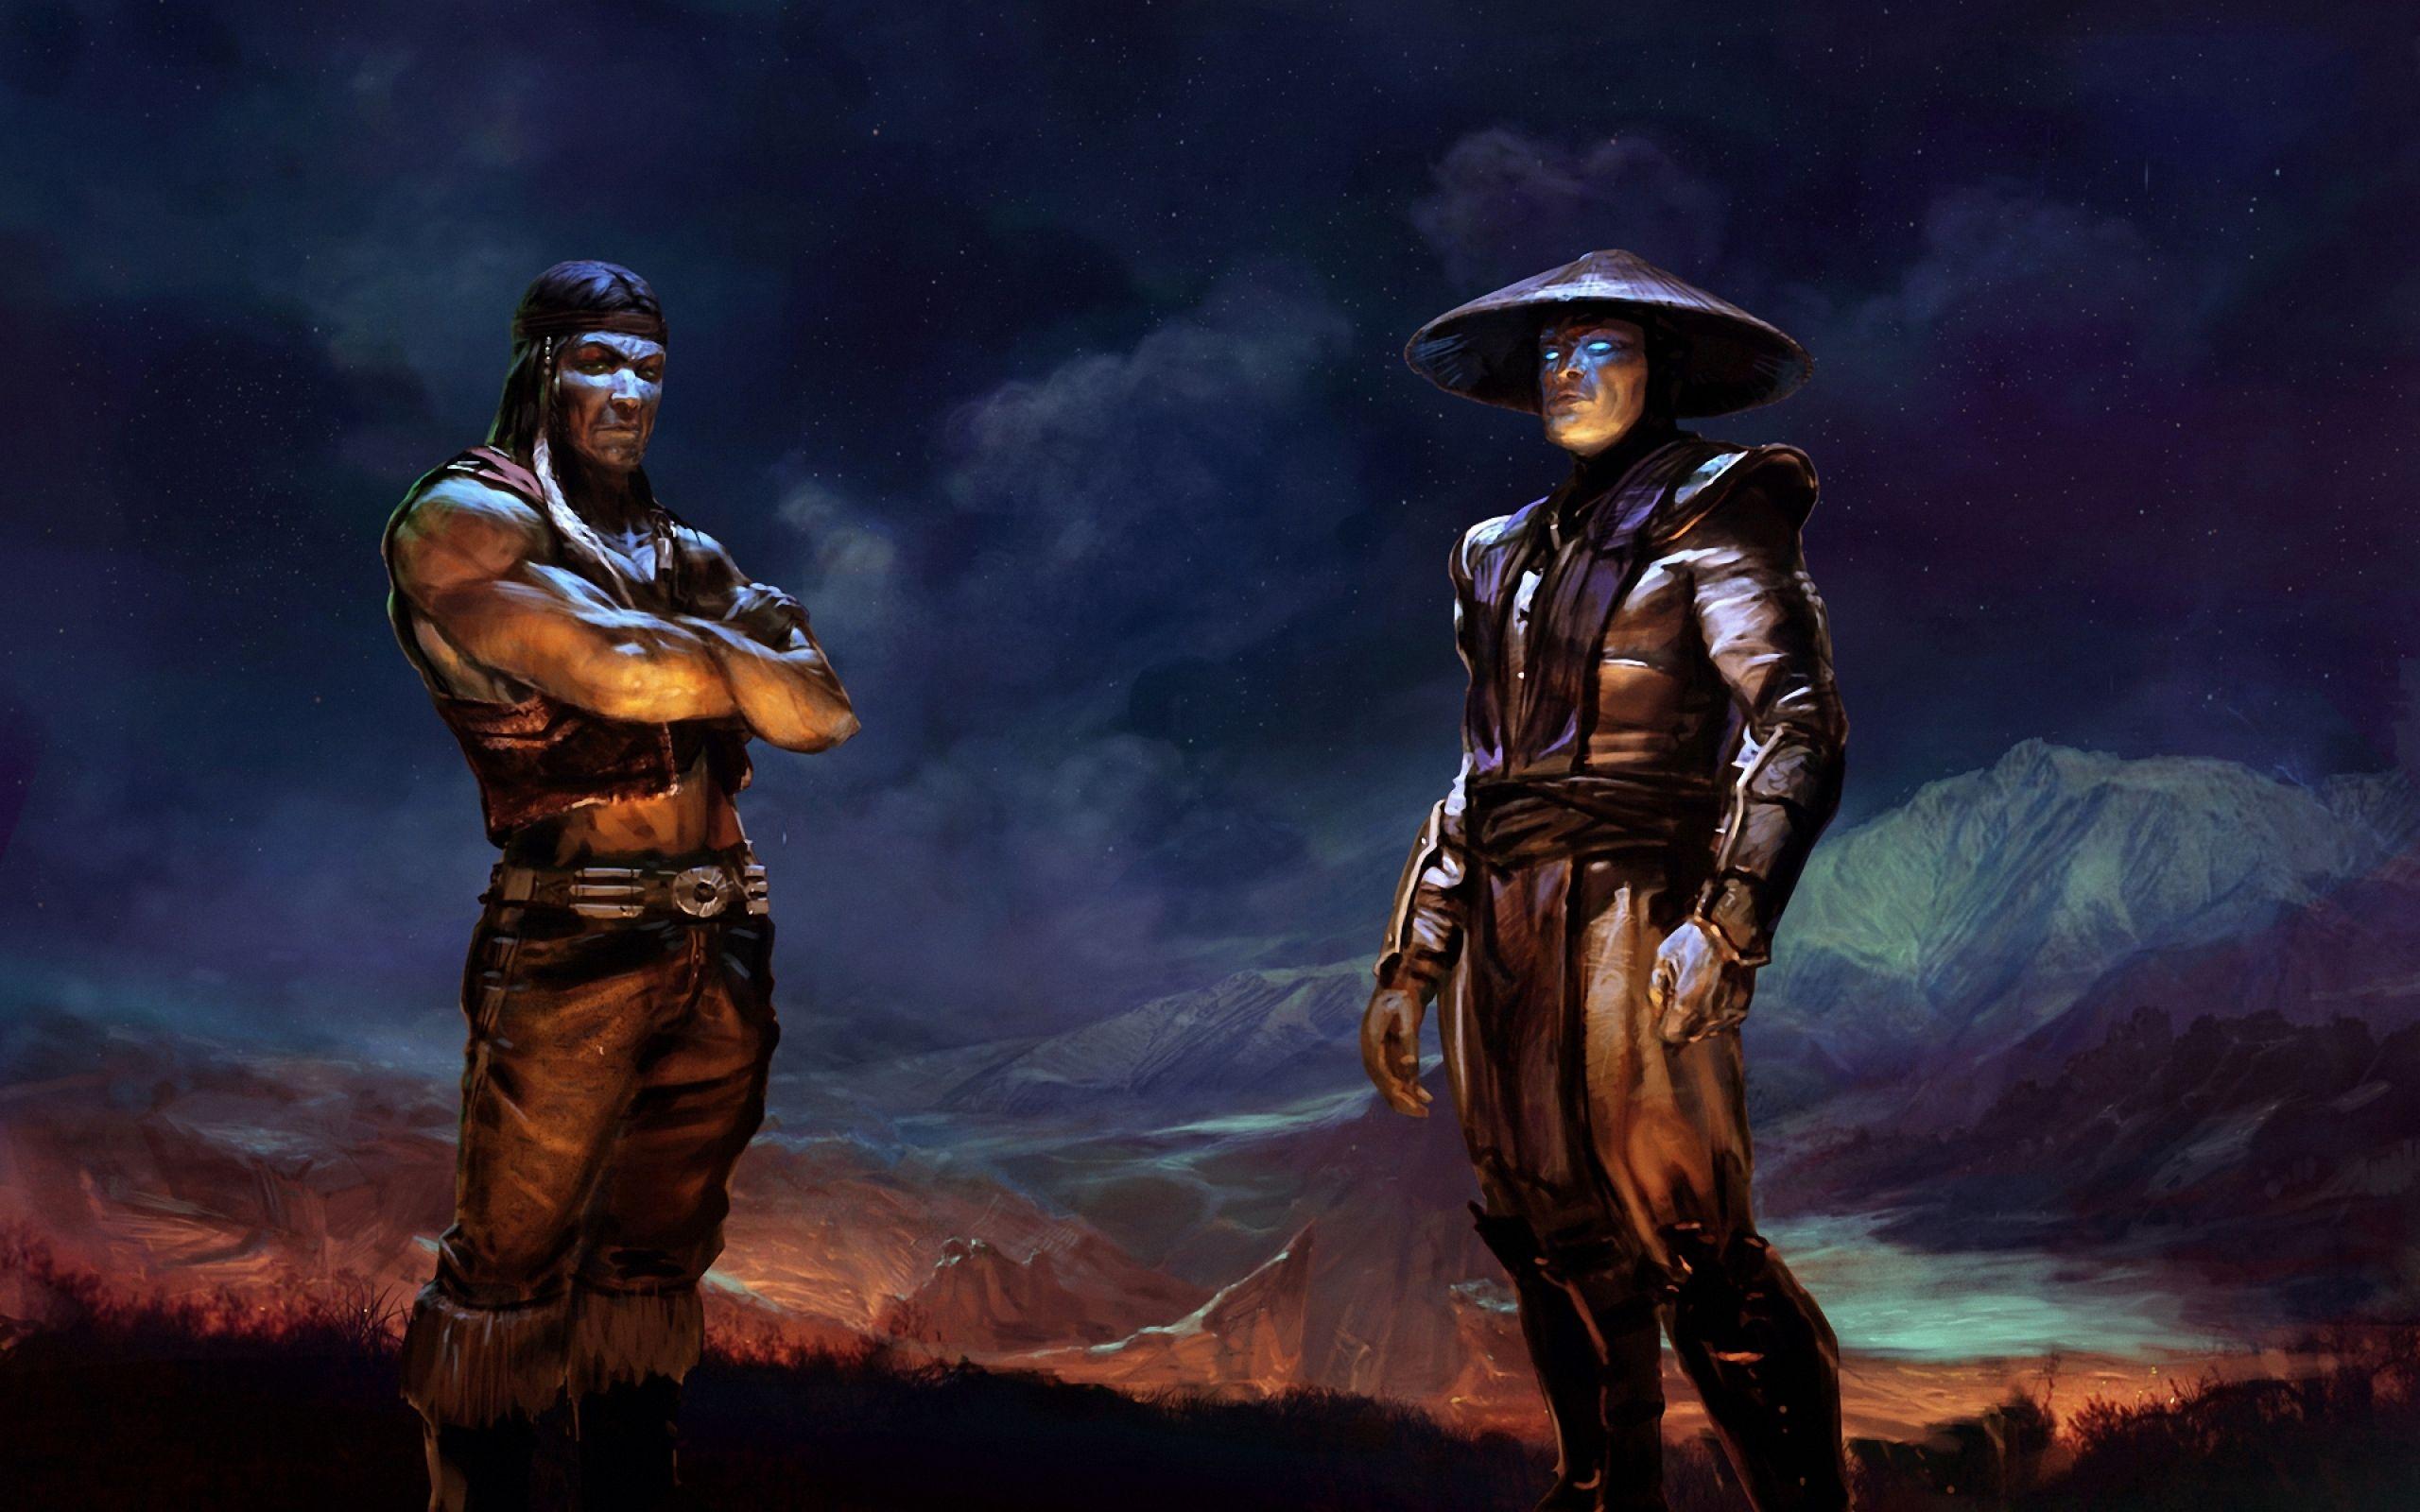 Download Wallpaper 2560x1600 Raiden, Mortal kombat